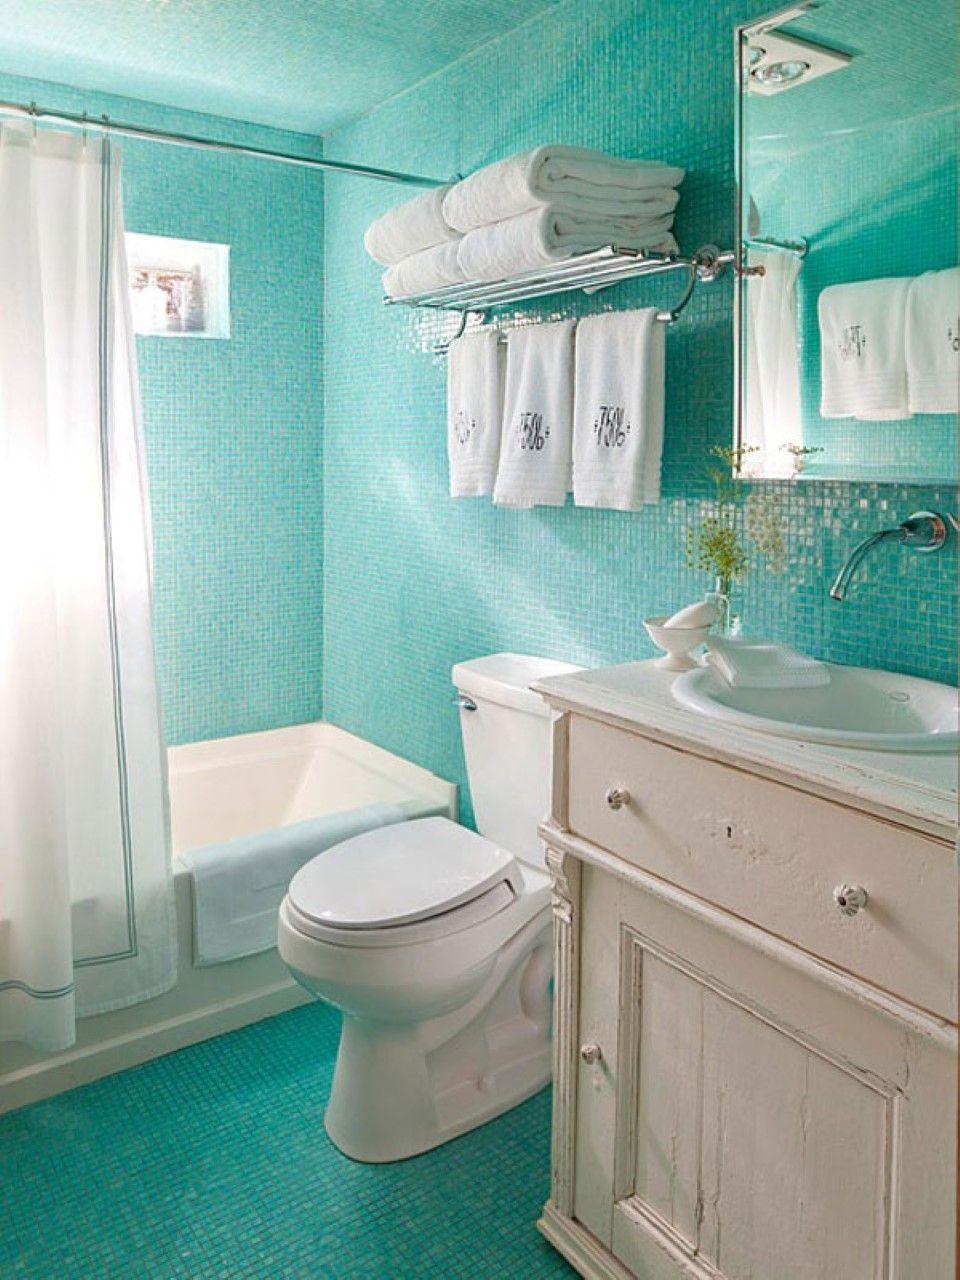 How To Create This Impressive Backyard Shed Bines Living Quarters A Bathroom